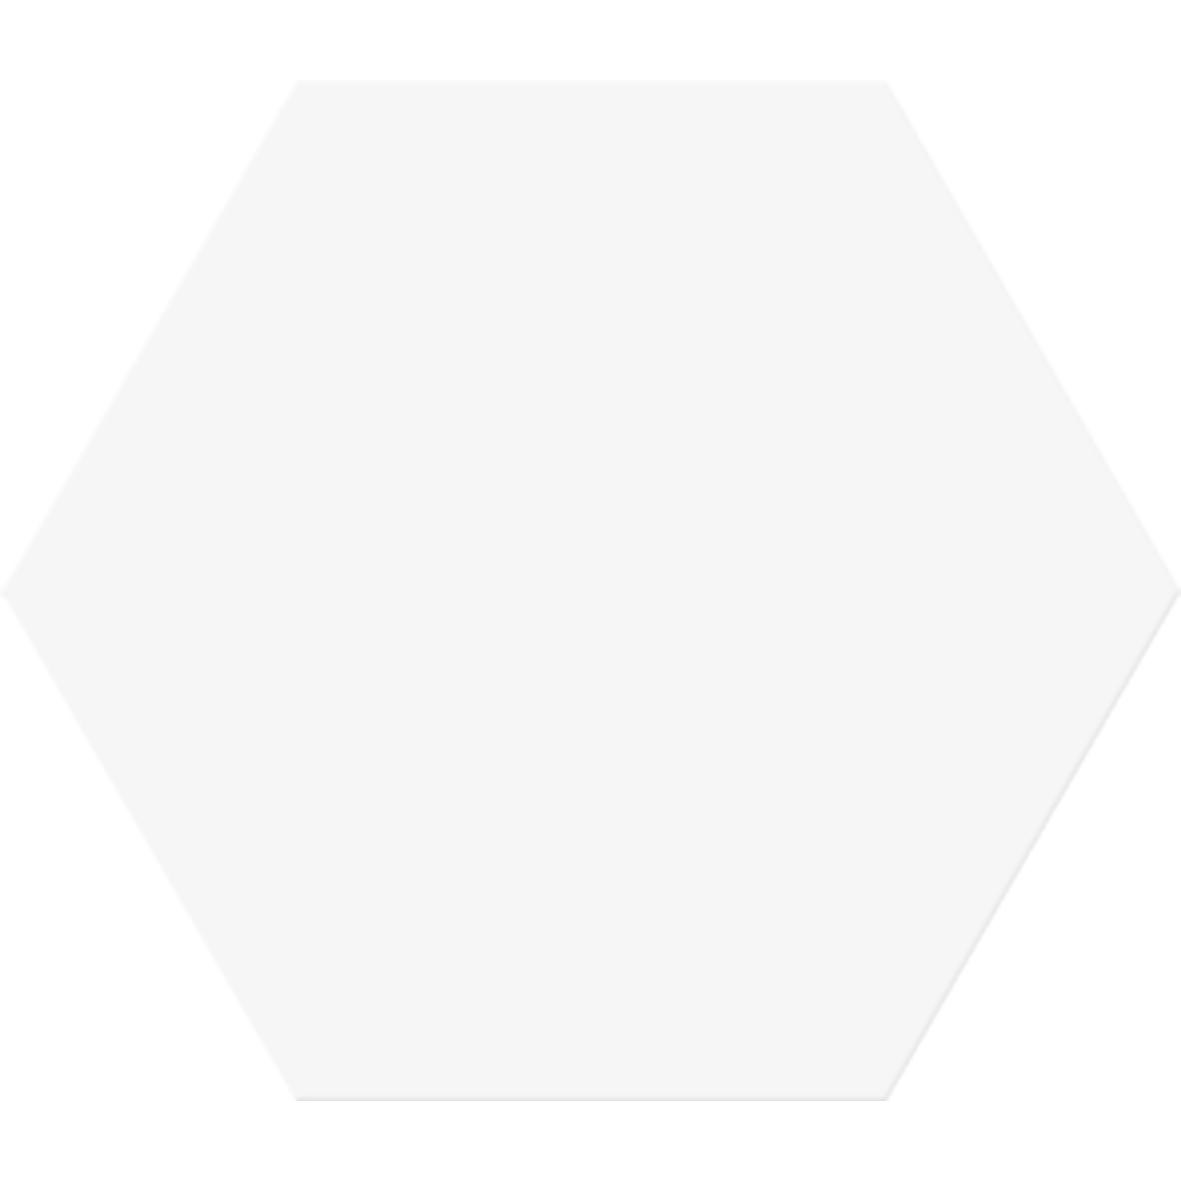 K53255380001VTE0, Miniworx, Valkoinen, lattia